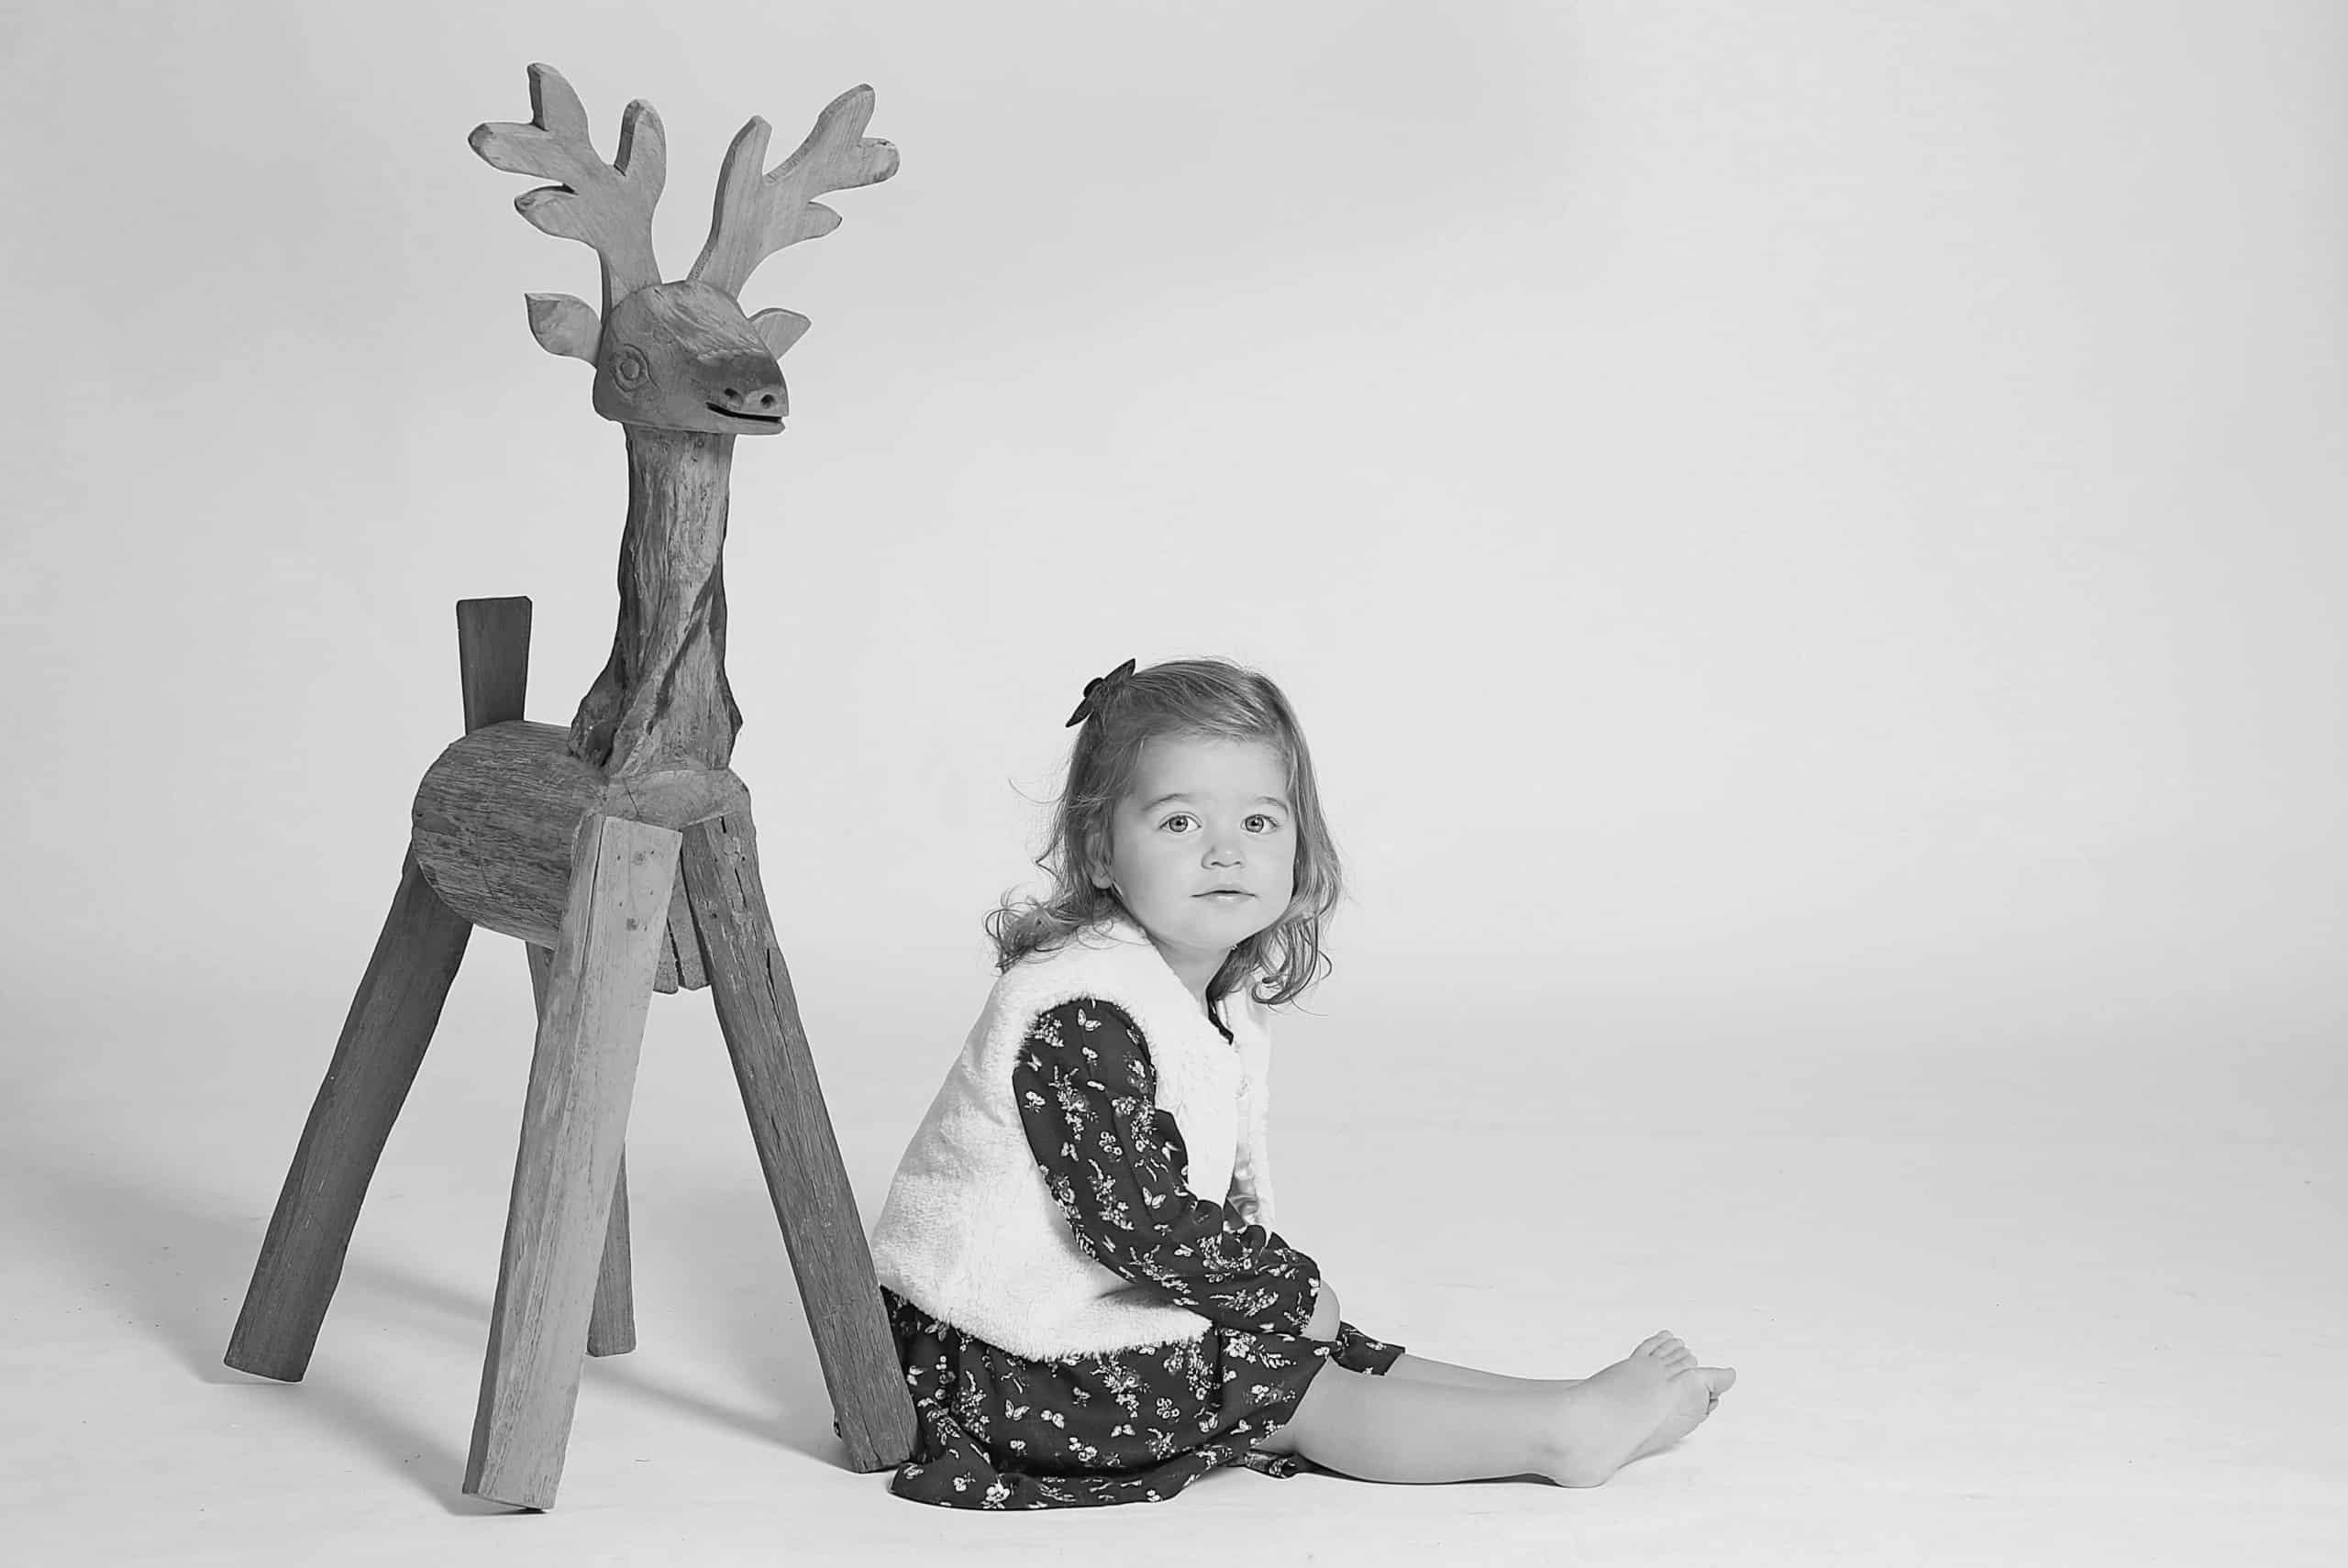 kinderfotograaf zwart wit foto